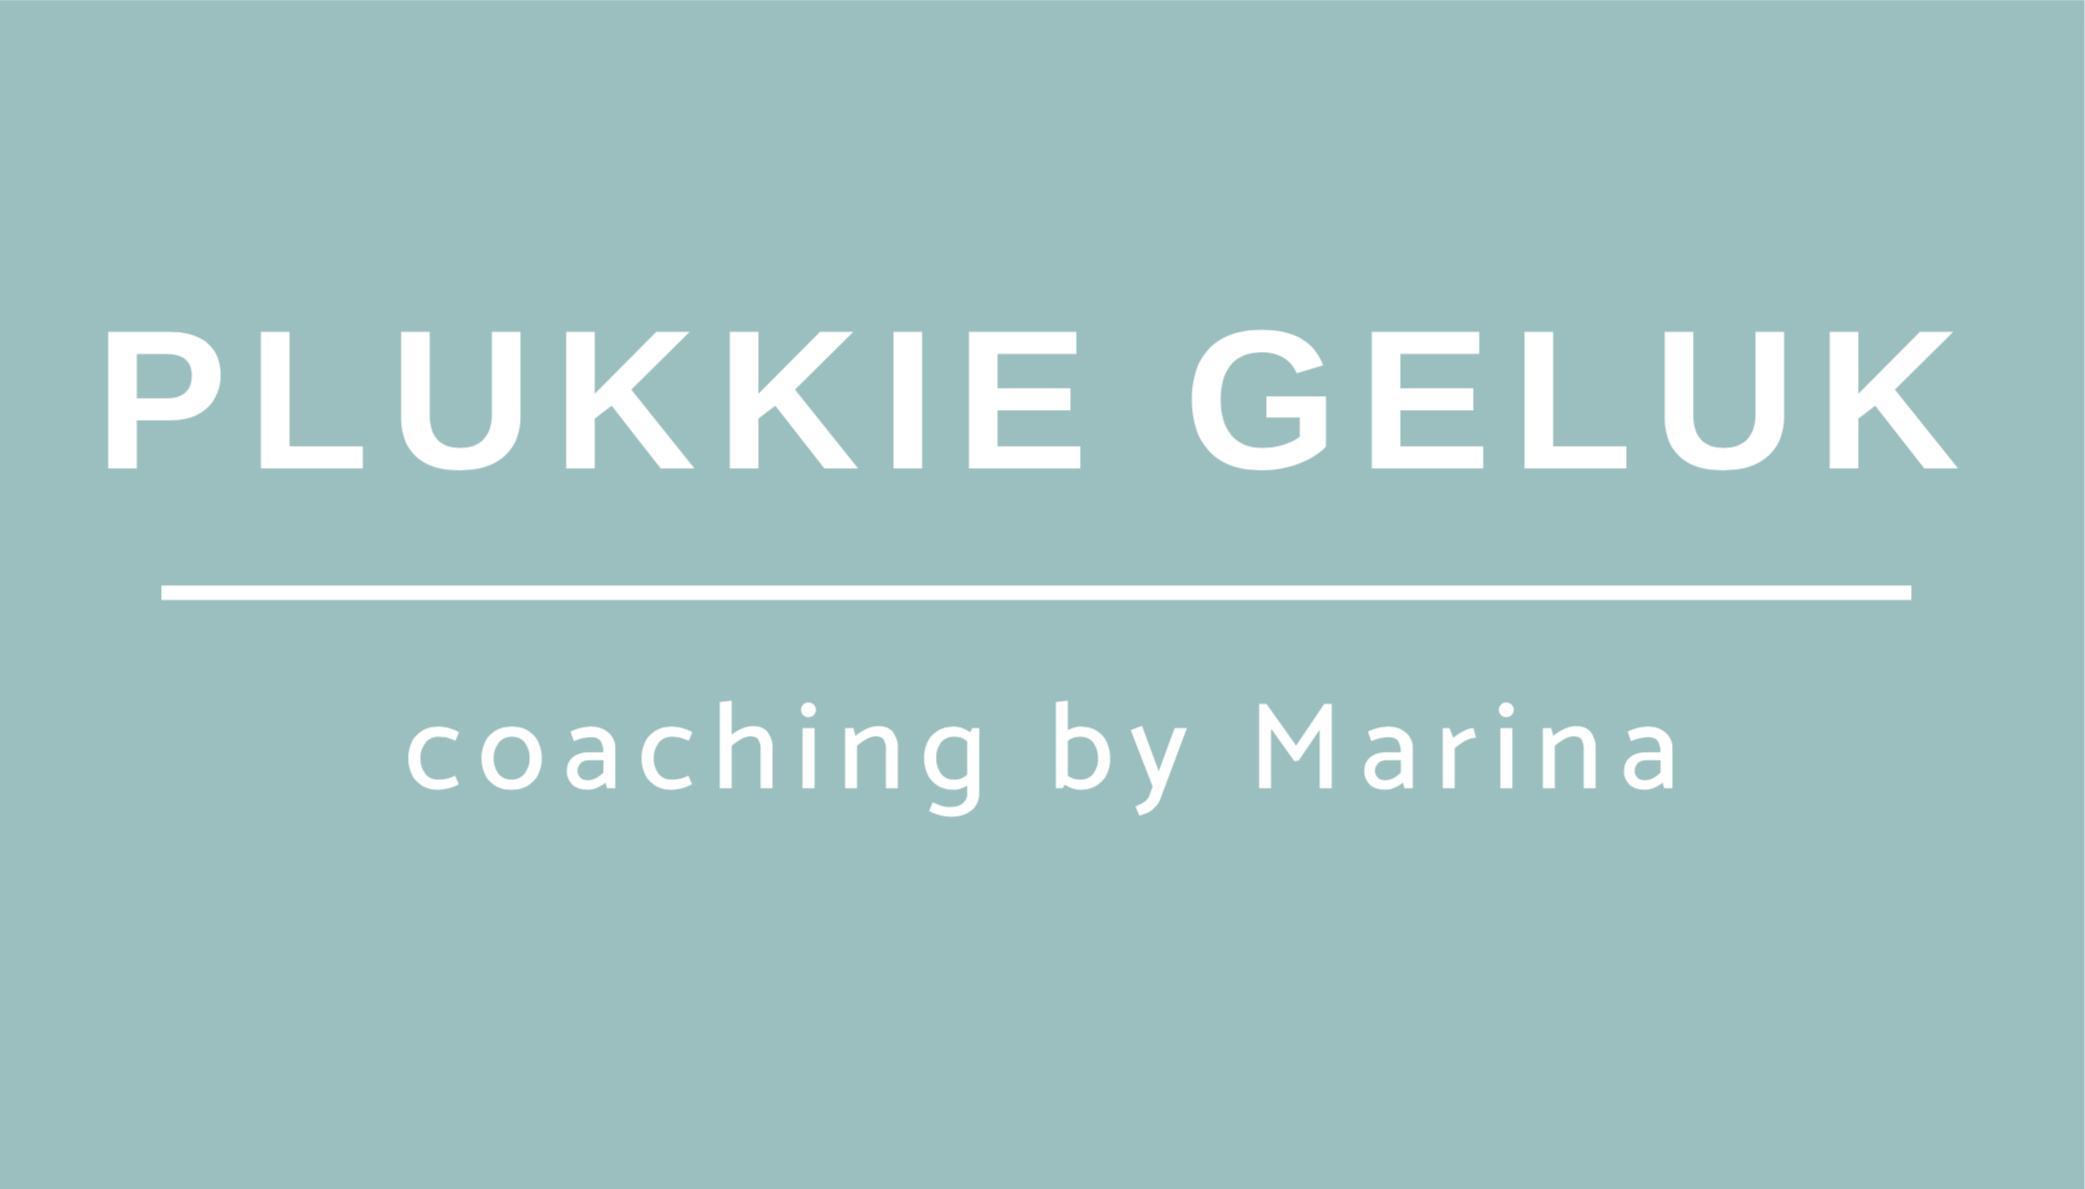 Plukkie Geluk coaching by Marina